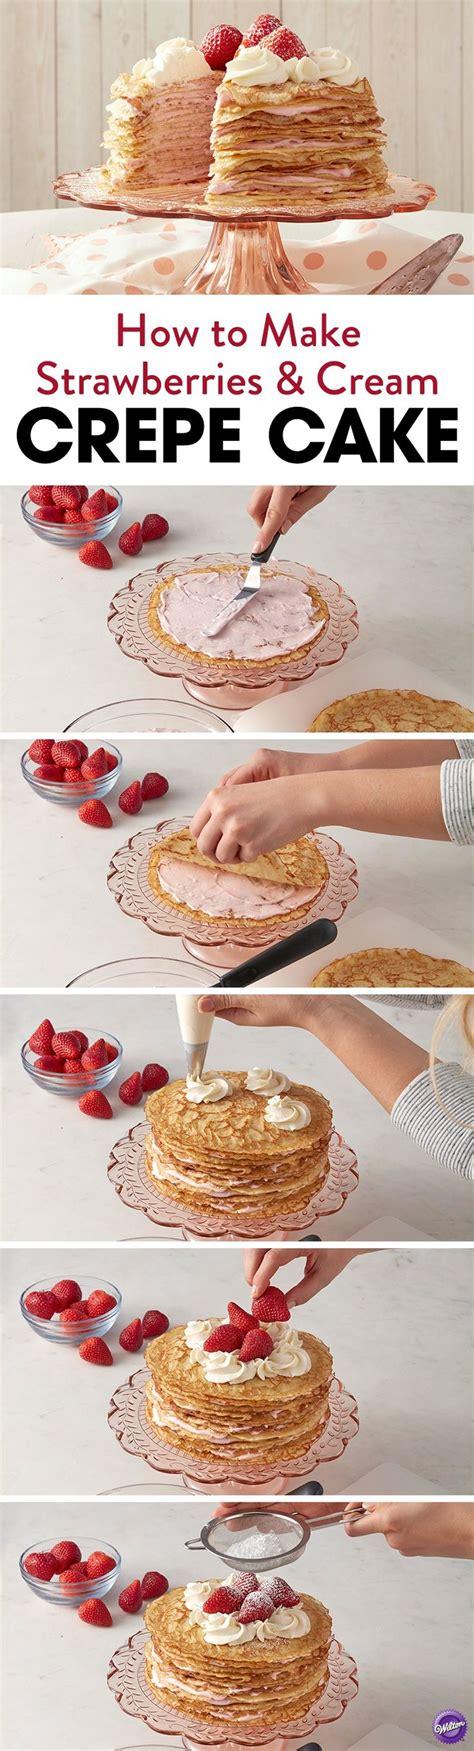 easy bake games secrets to decorating layer cakes 283 best cake hacks baking tips images on pinterest